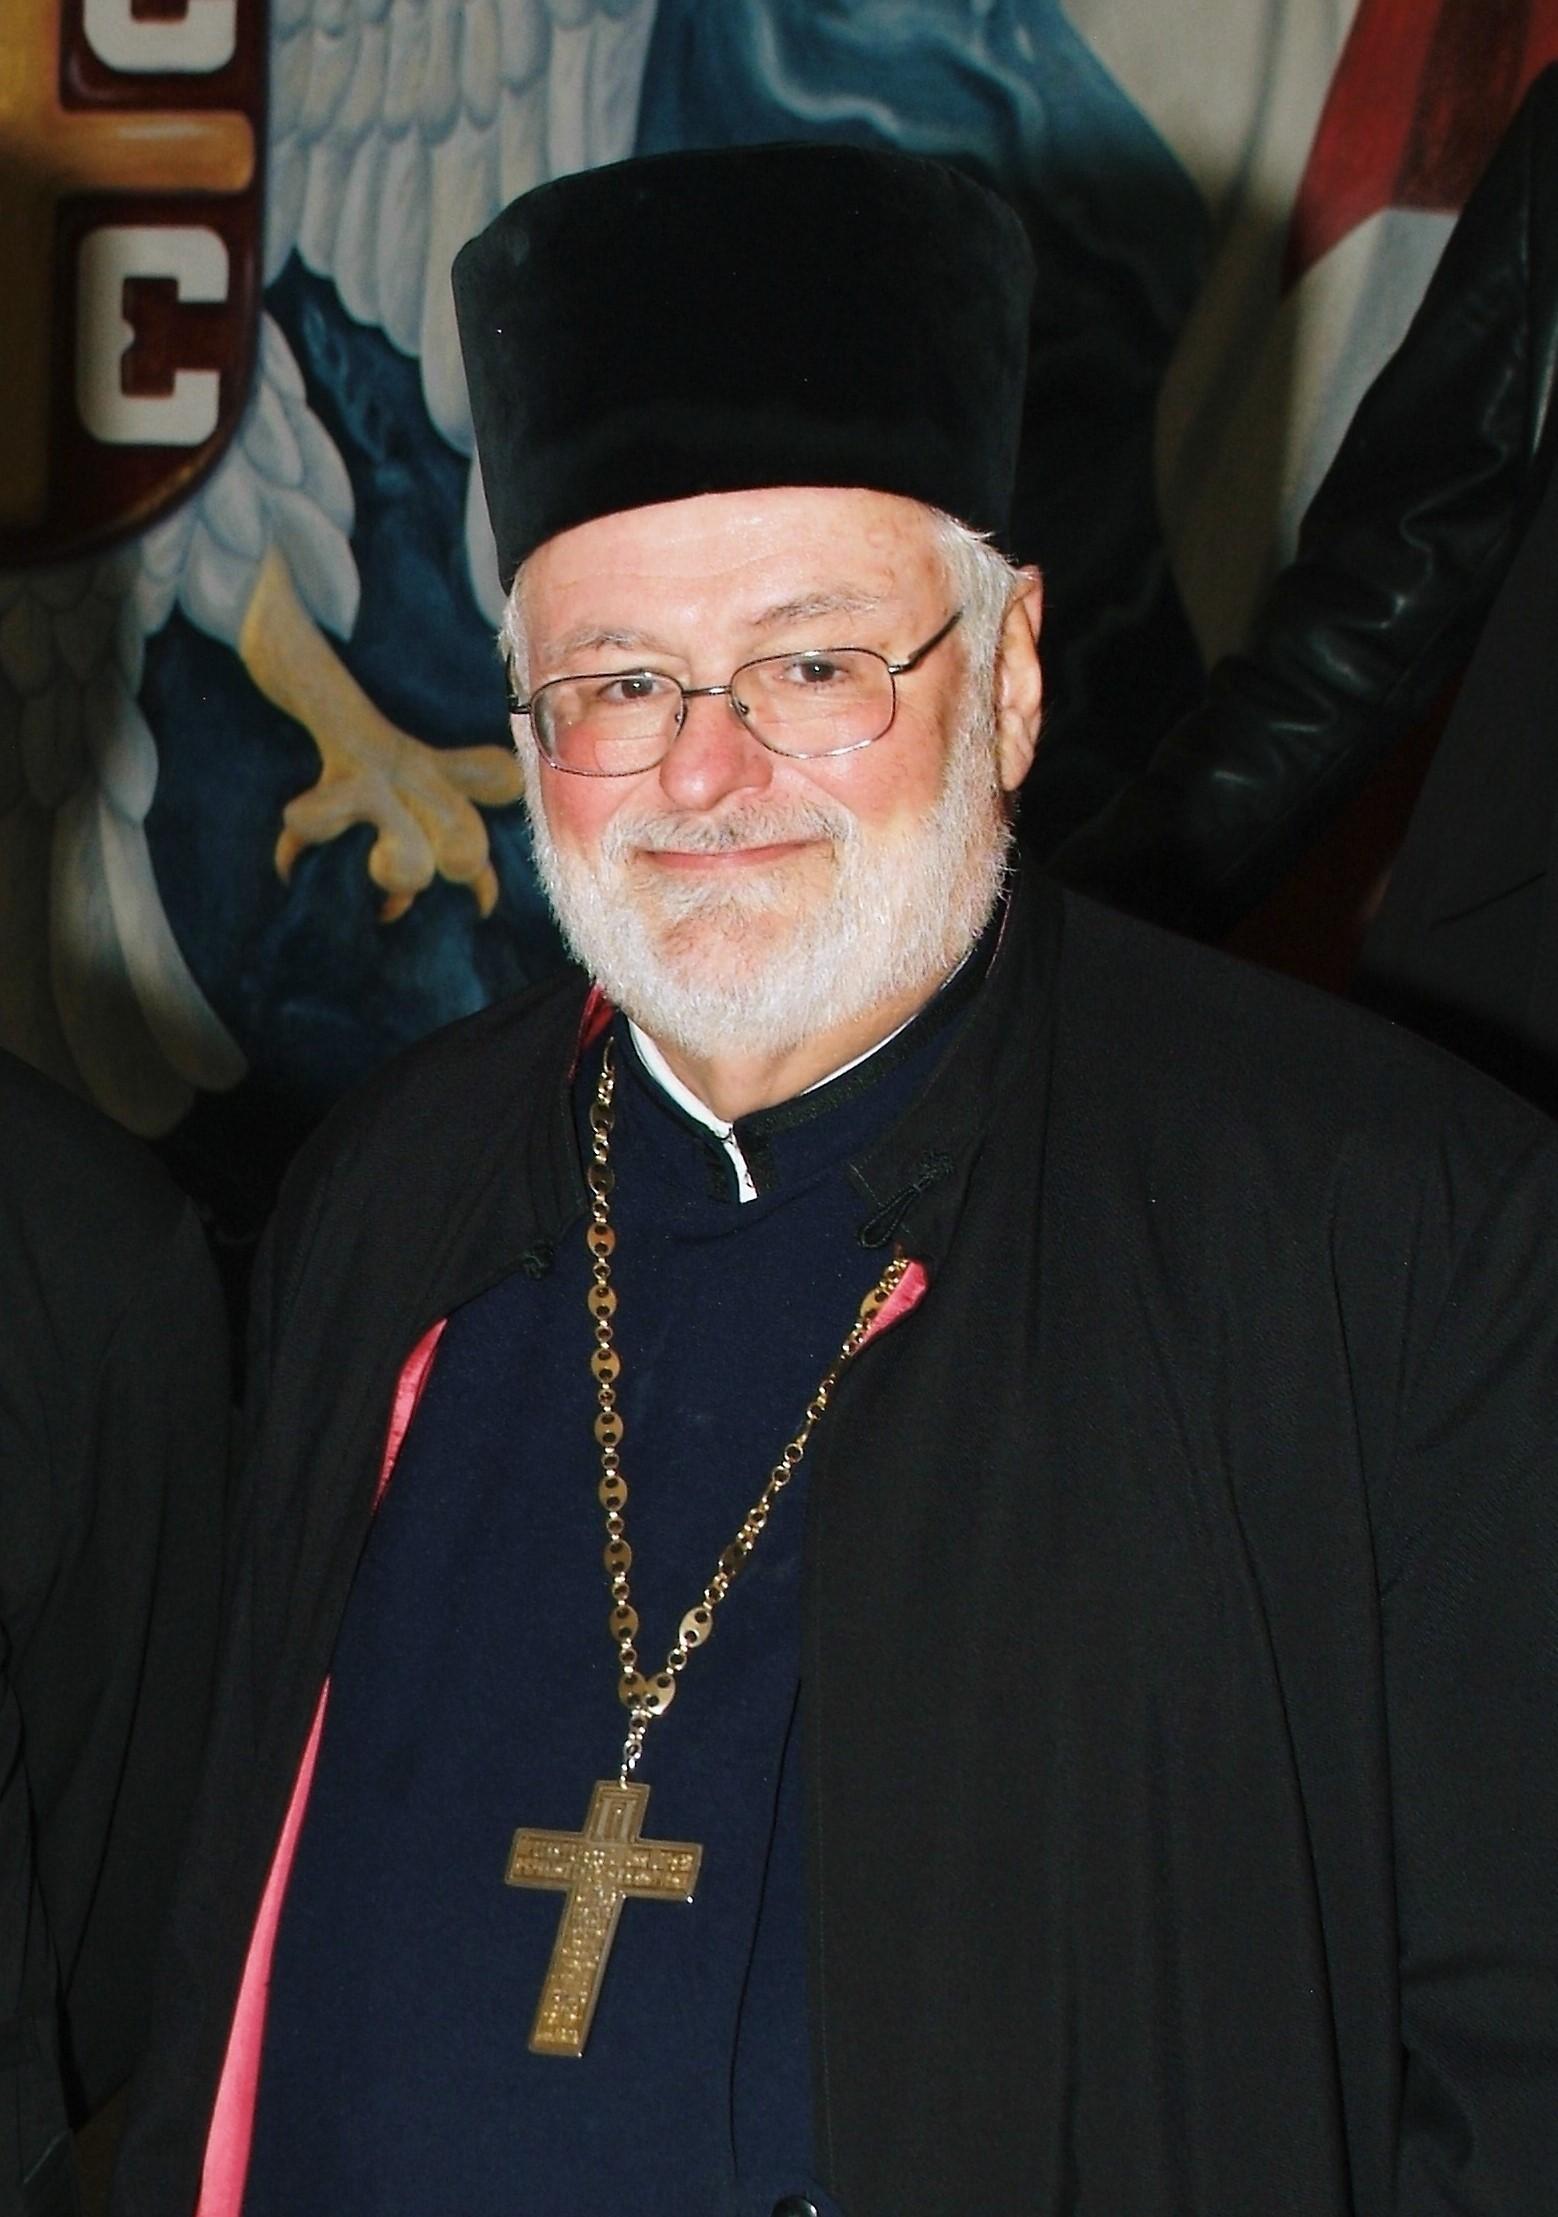 Father Michael Joseph Doder